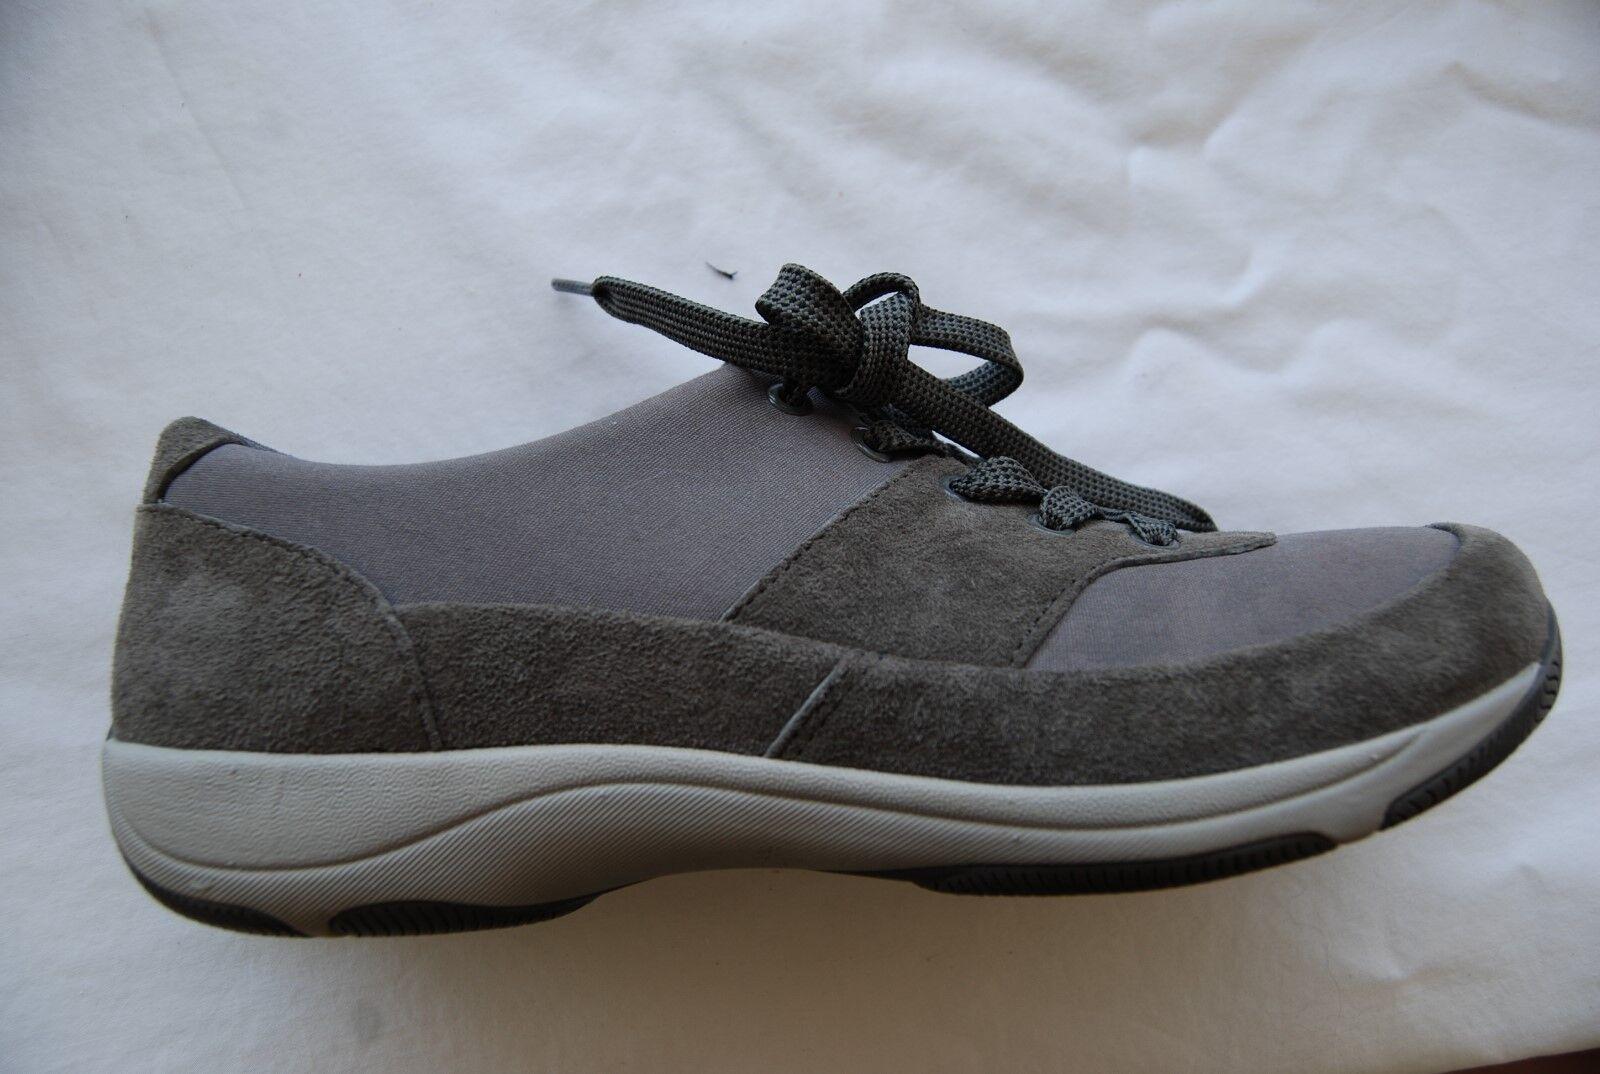 Dark Gray Suede Sneaker  Textile DANSKO Laced Sneaker Suede Style Shoes EU 40 US 9.5 - 10 16f2e3